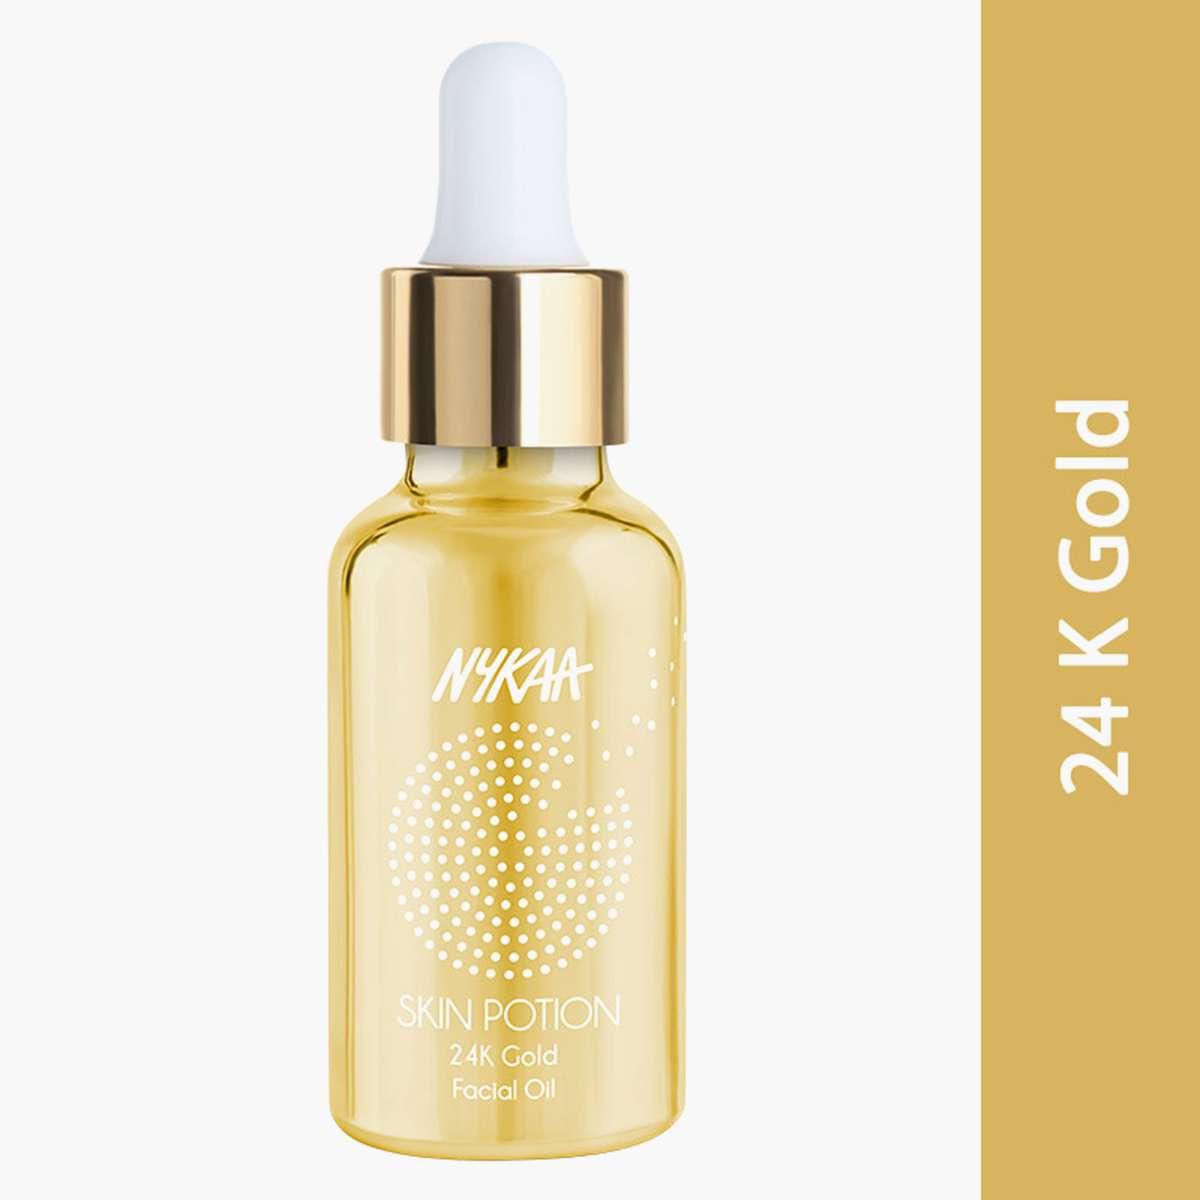 NYKAA Skin Potion 24K Gold Face Oil